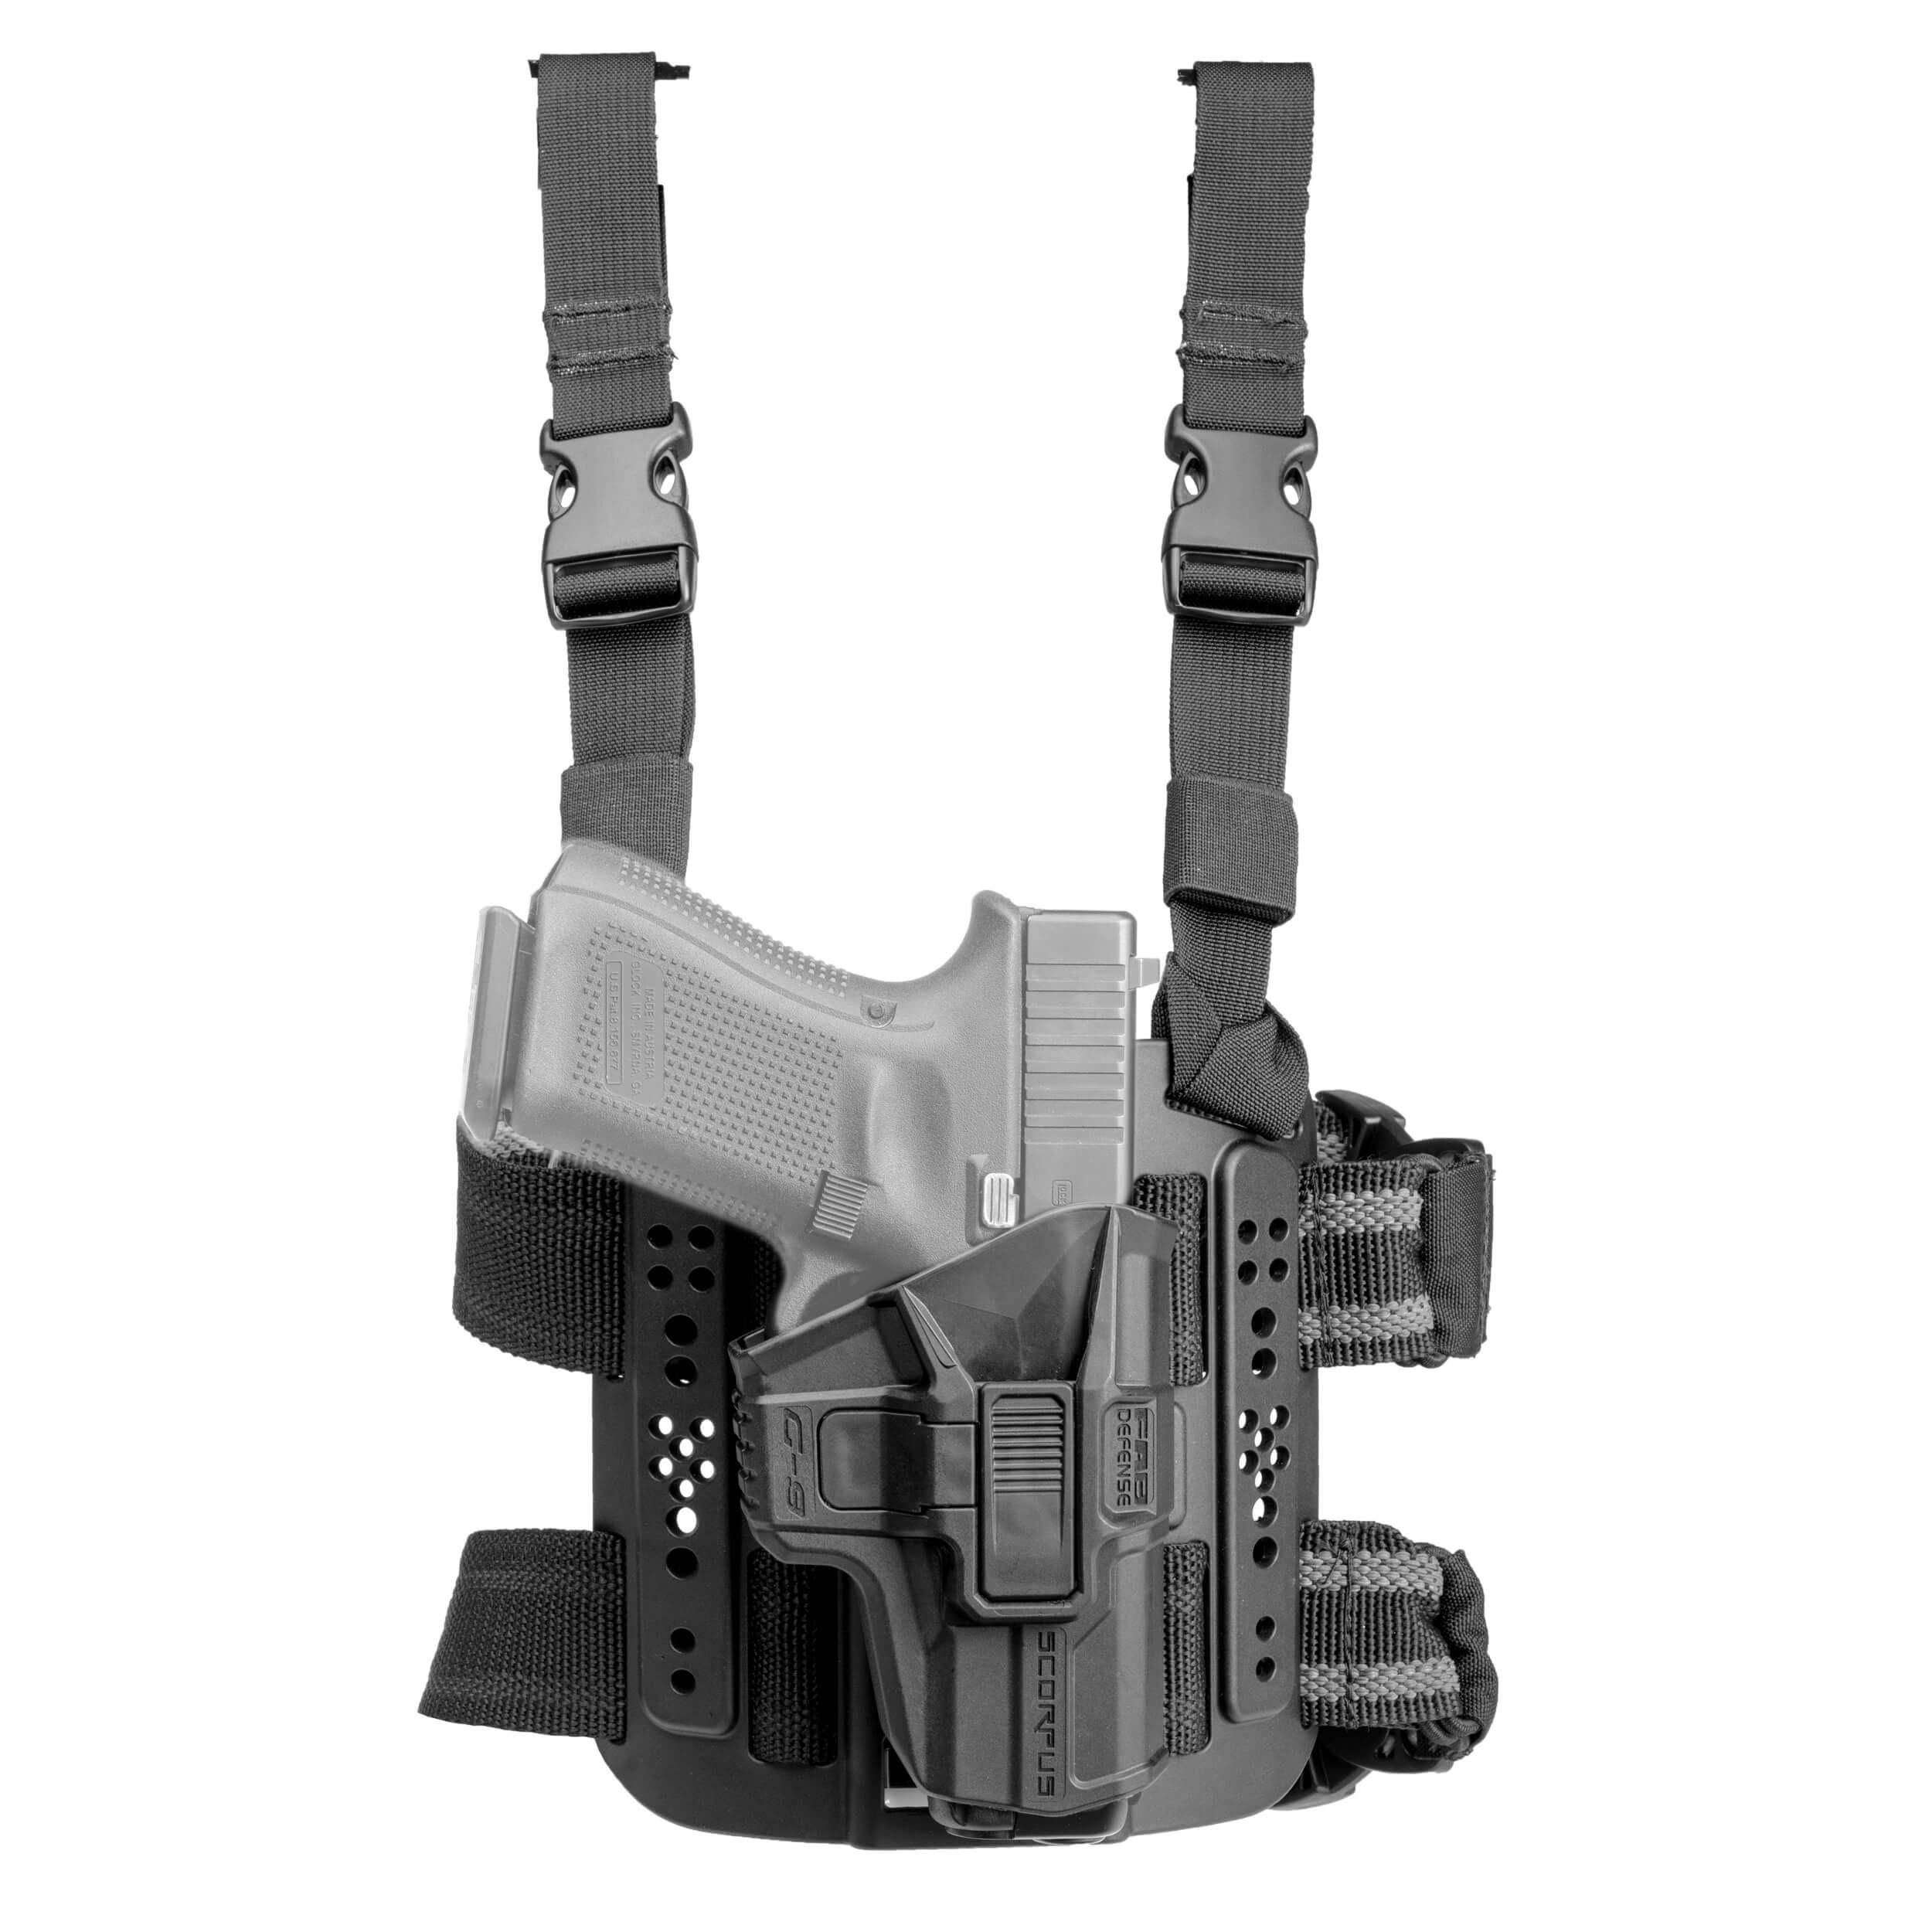 Oberschenkelholster MTR Glock 17/19